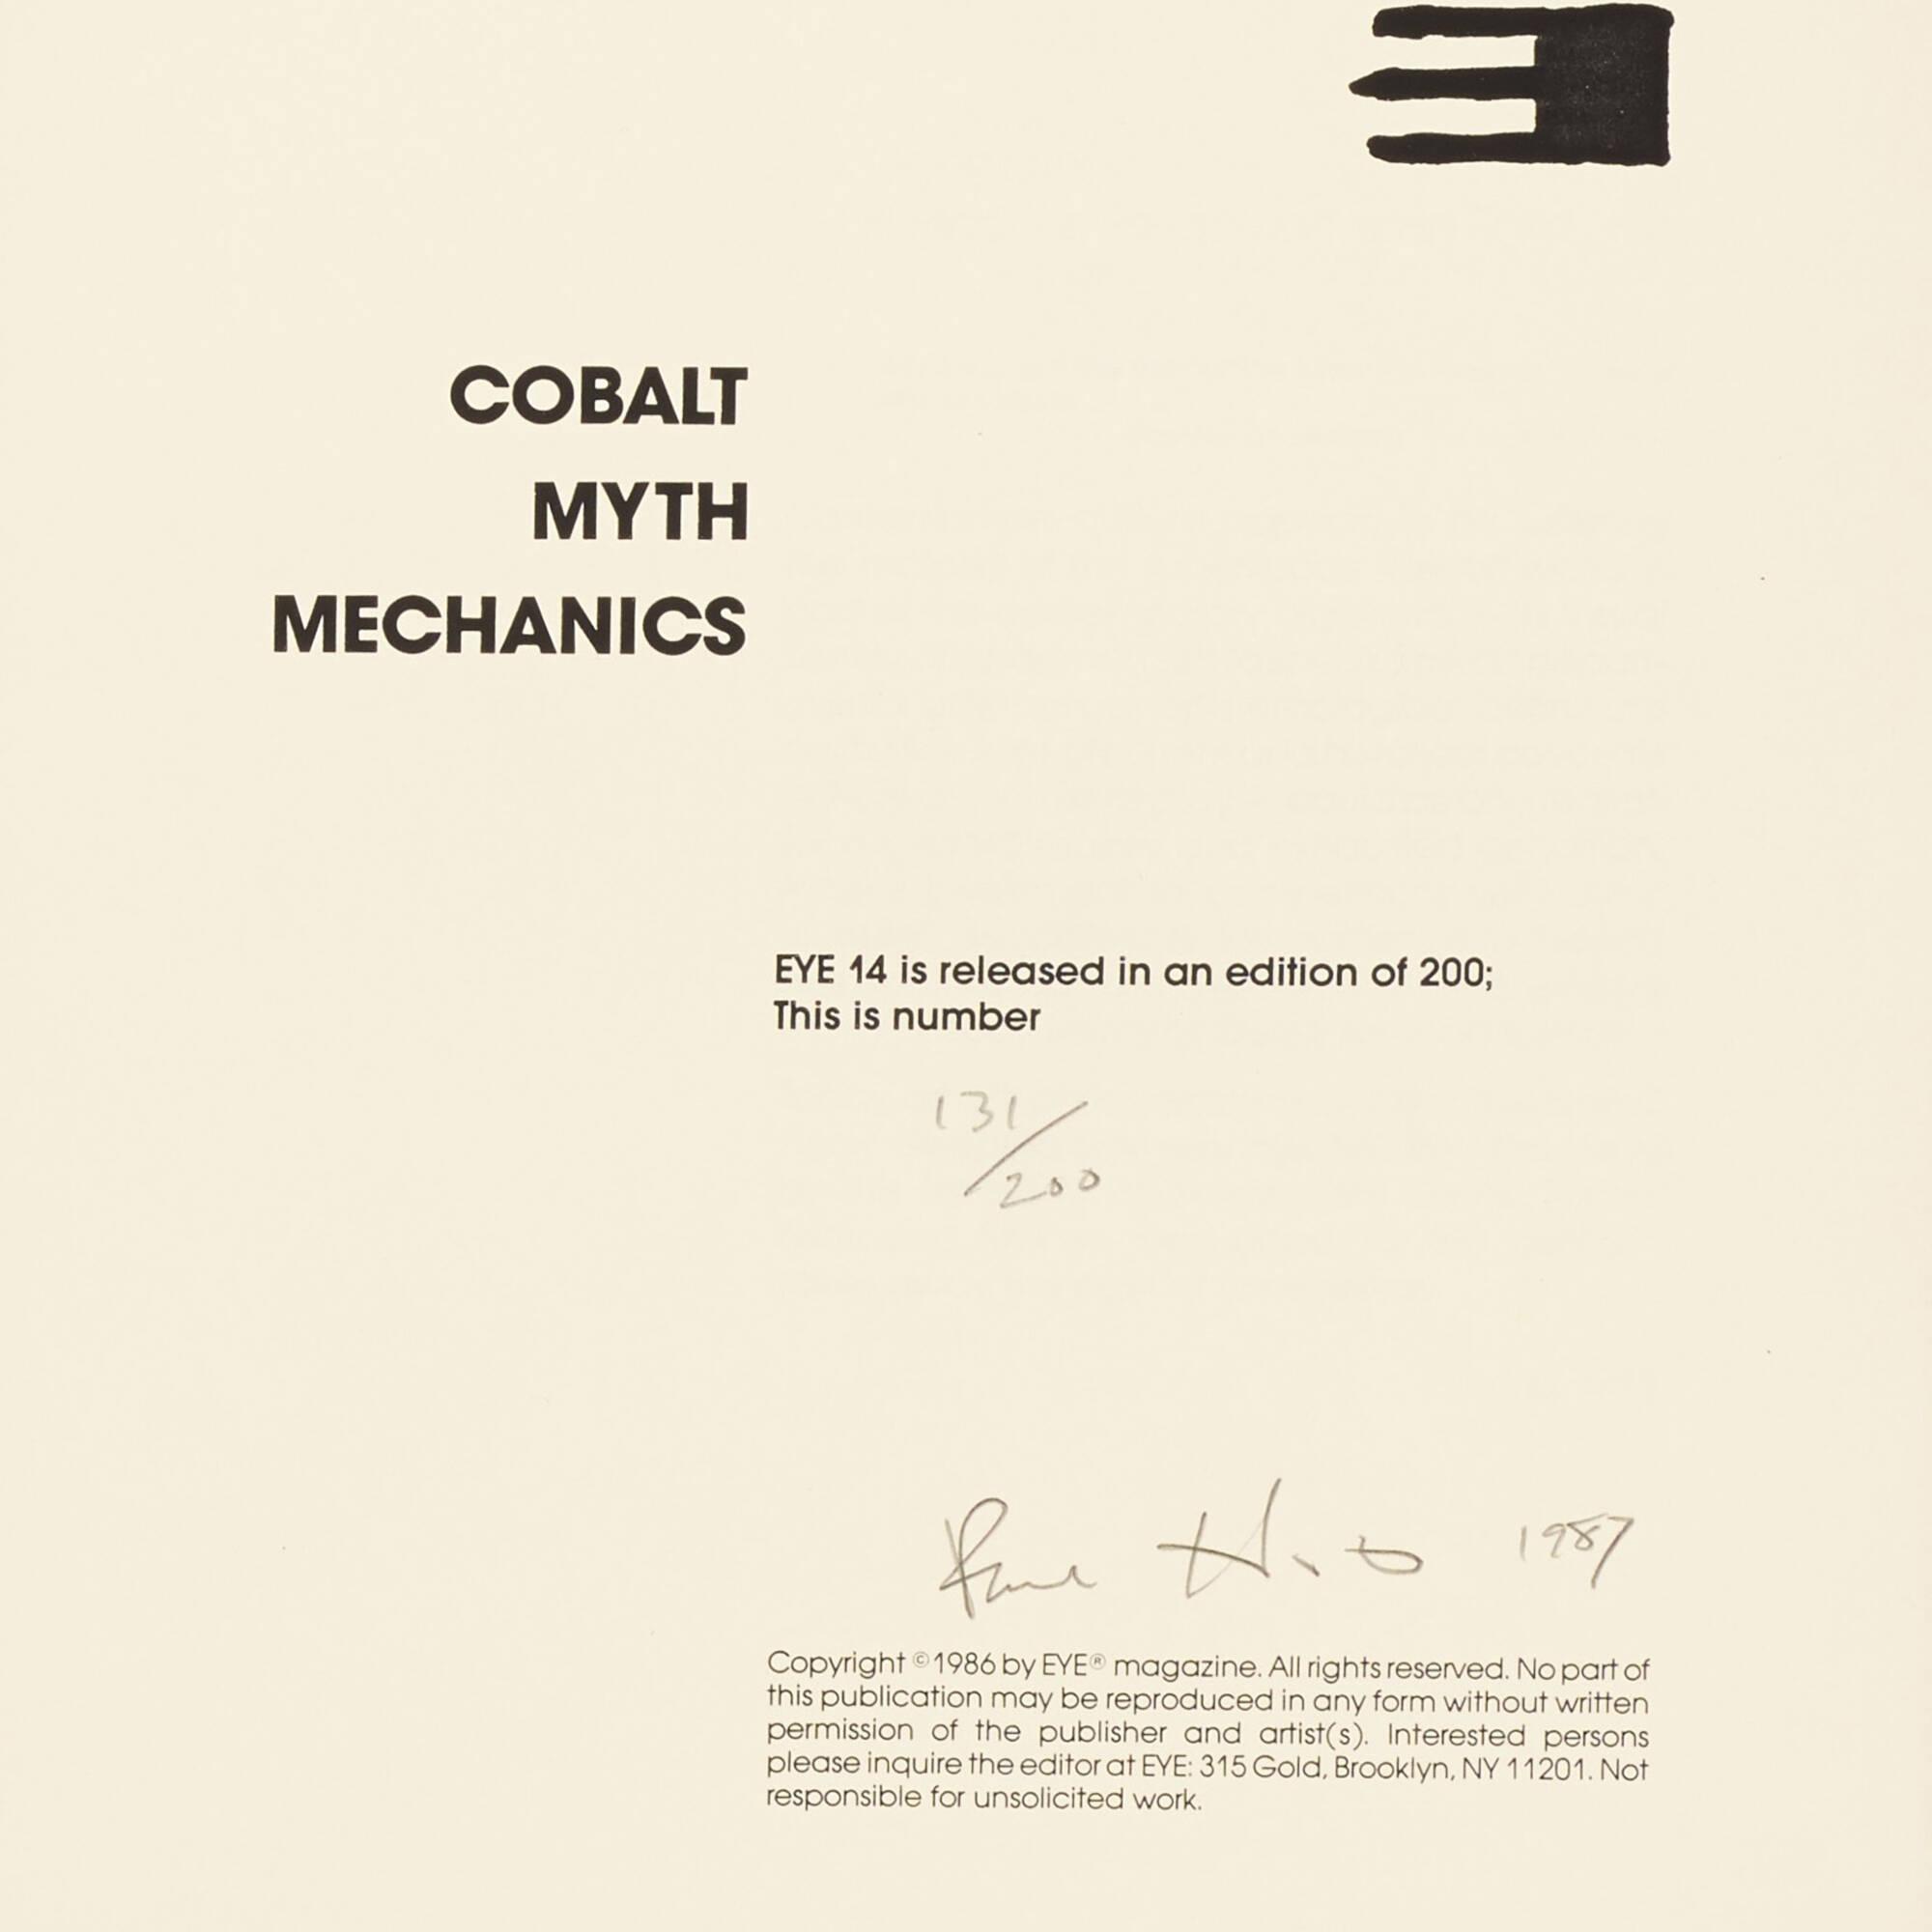 155: Various Artists including David Hammons / Eye Magazine #14: Cobalt Myth Mechanics (four examples) (2 of 6)